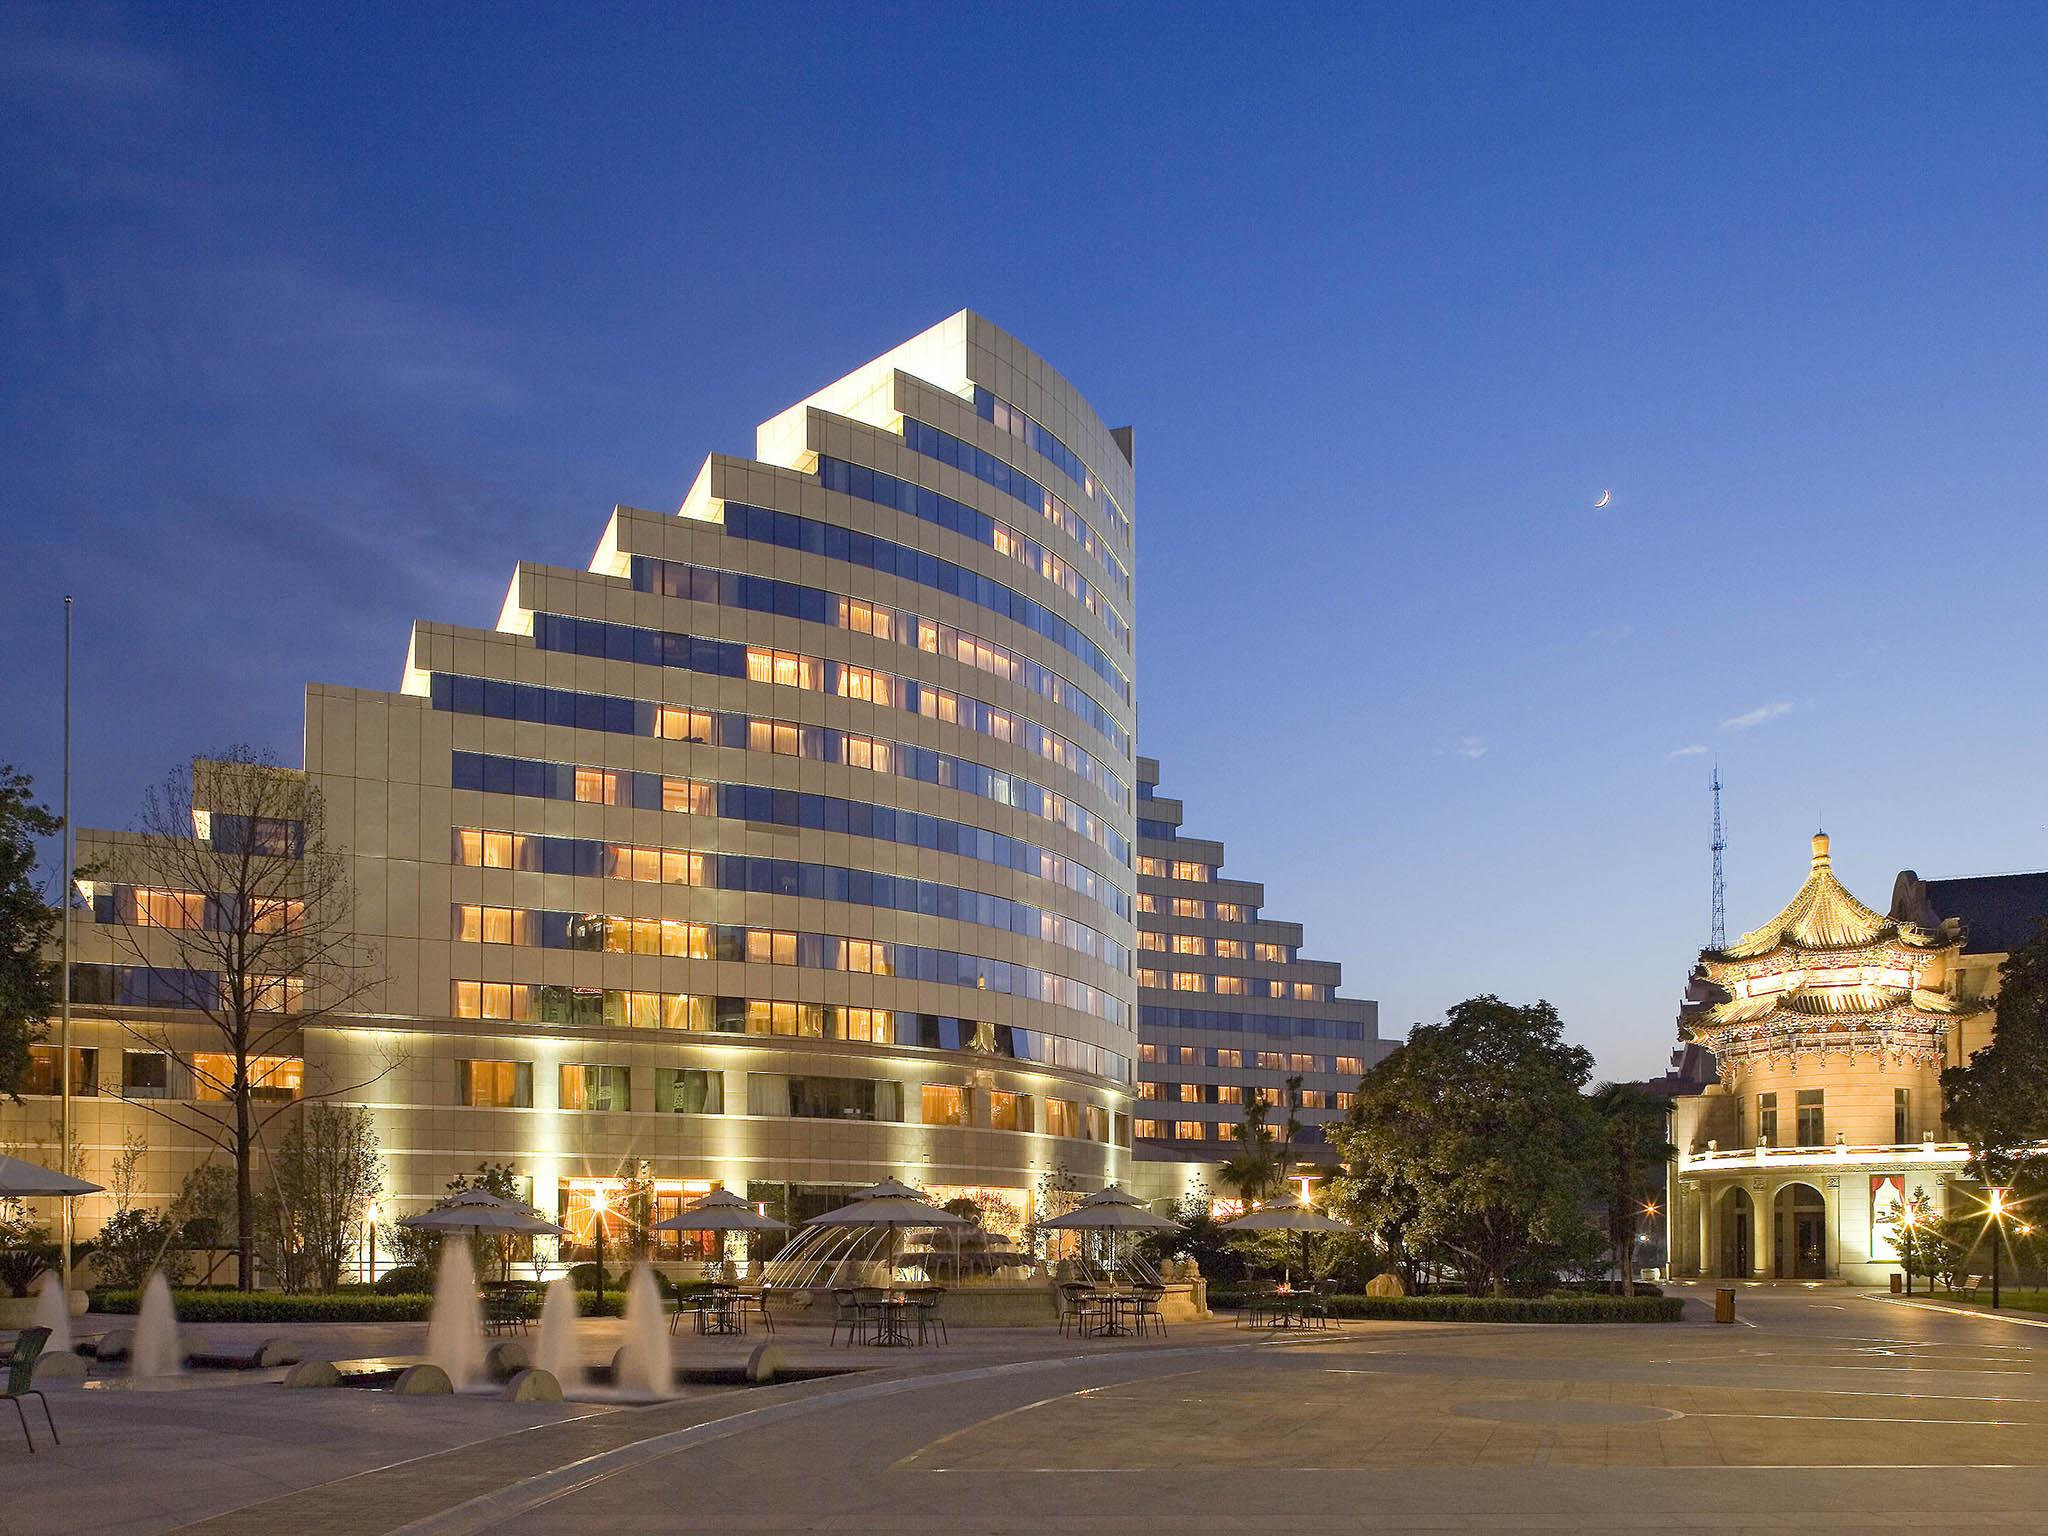 Hotel – Sofitel Xian On Renmin Square